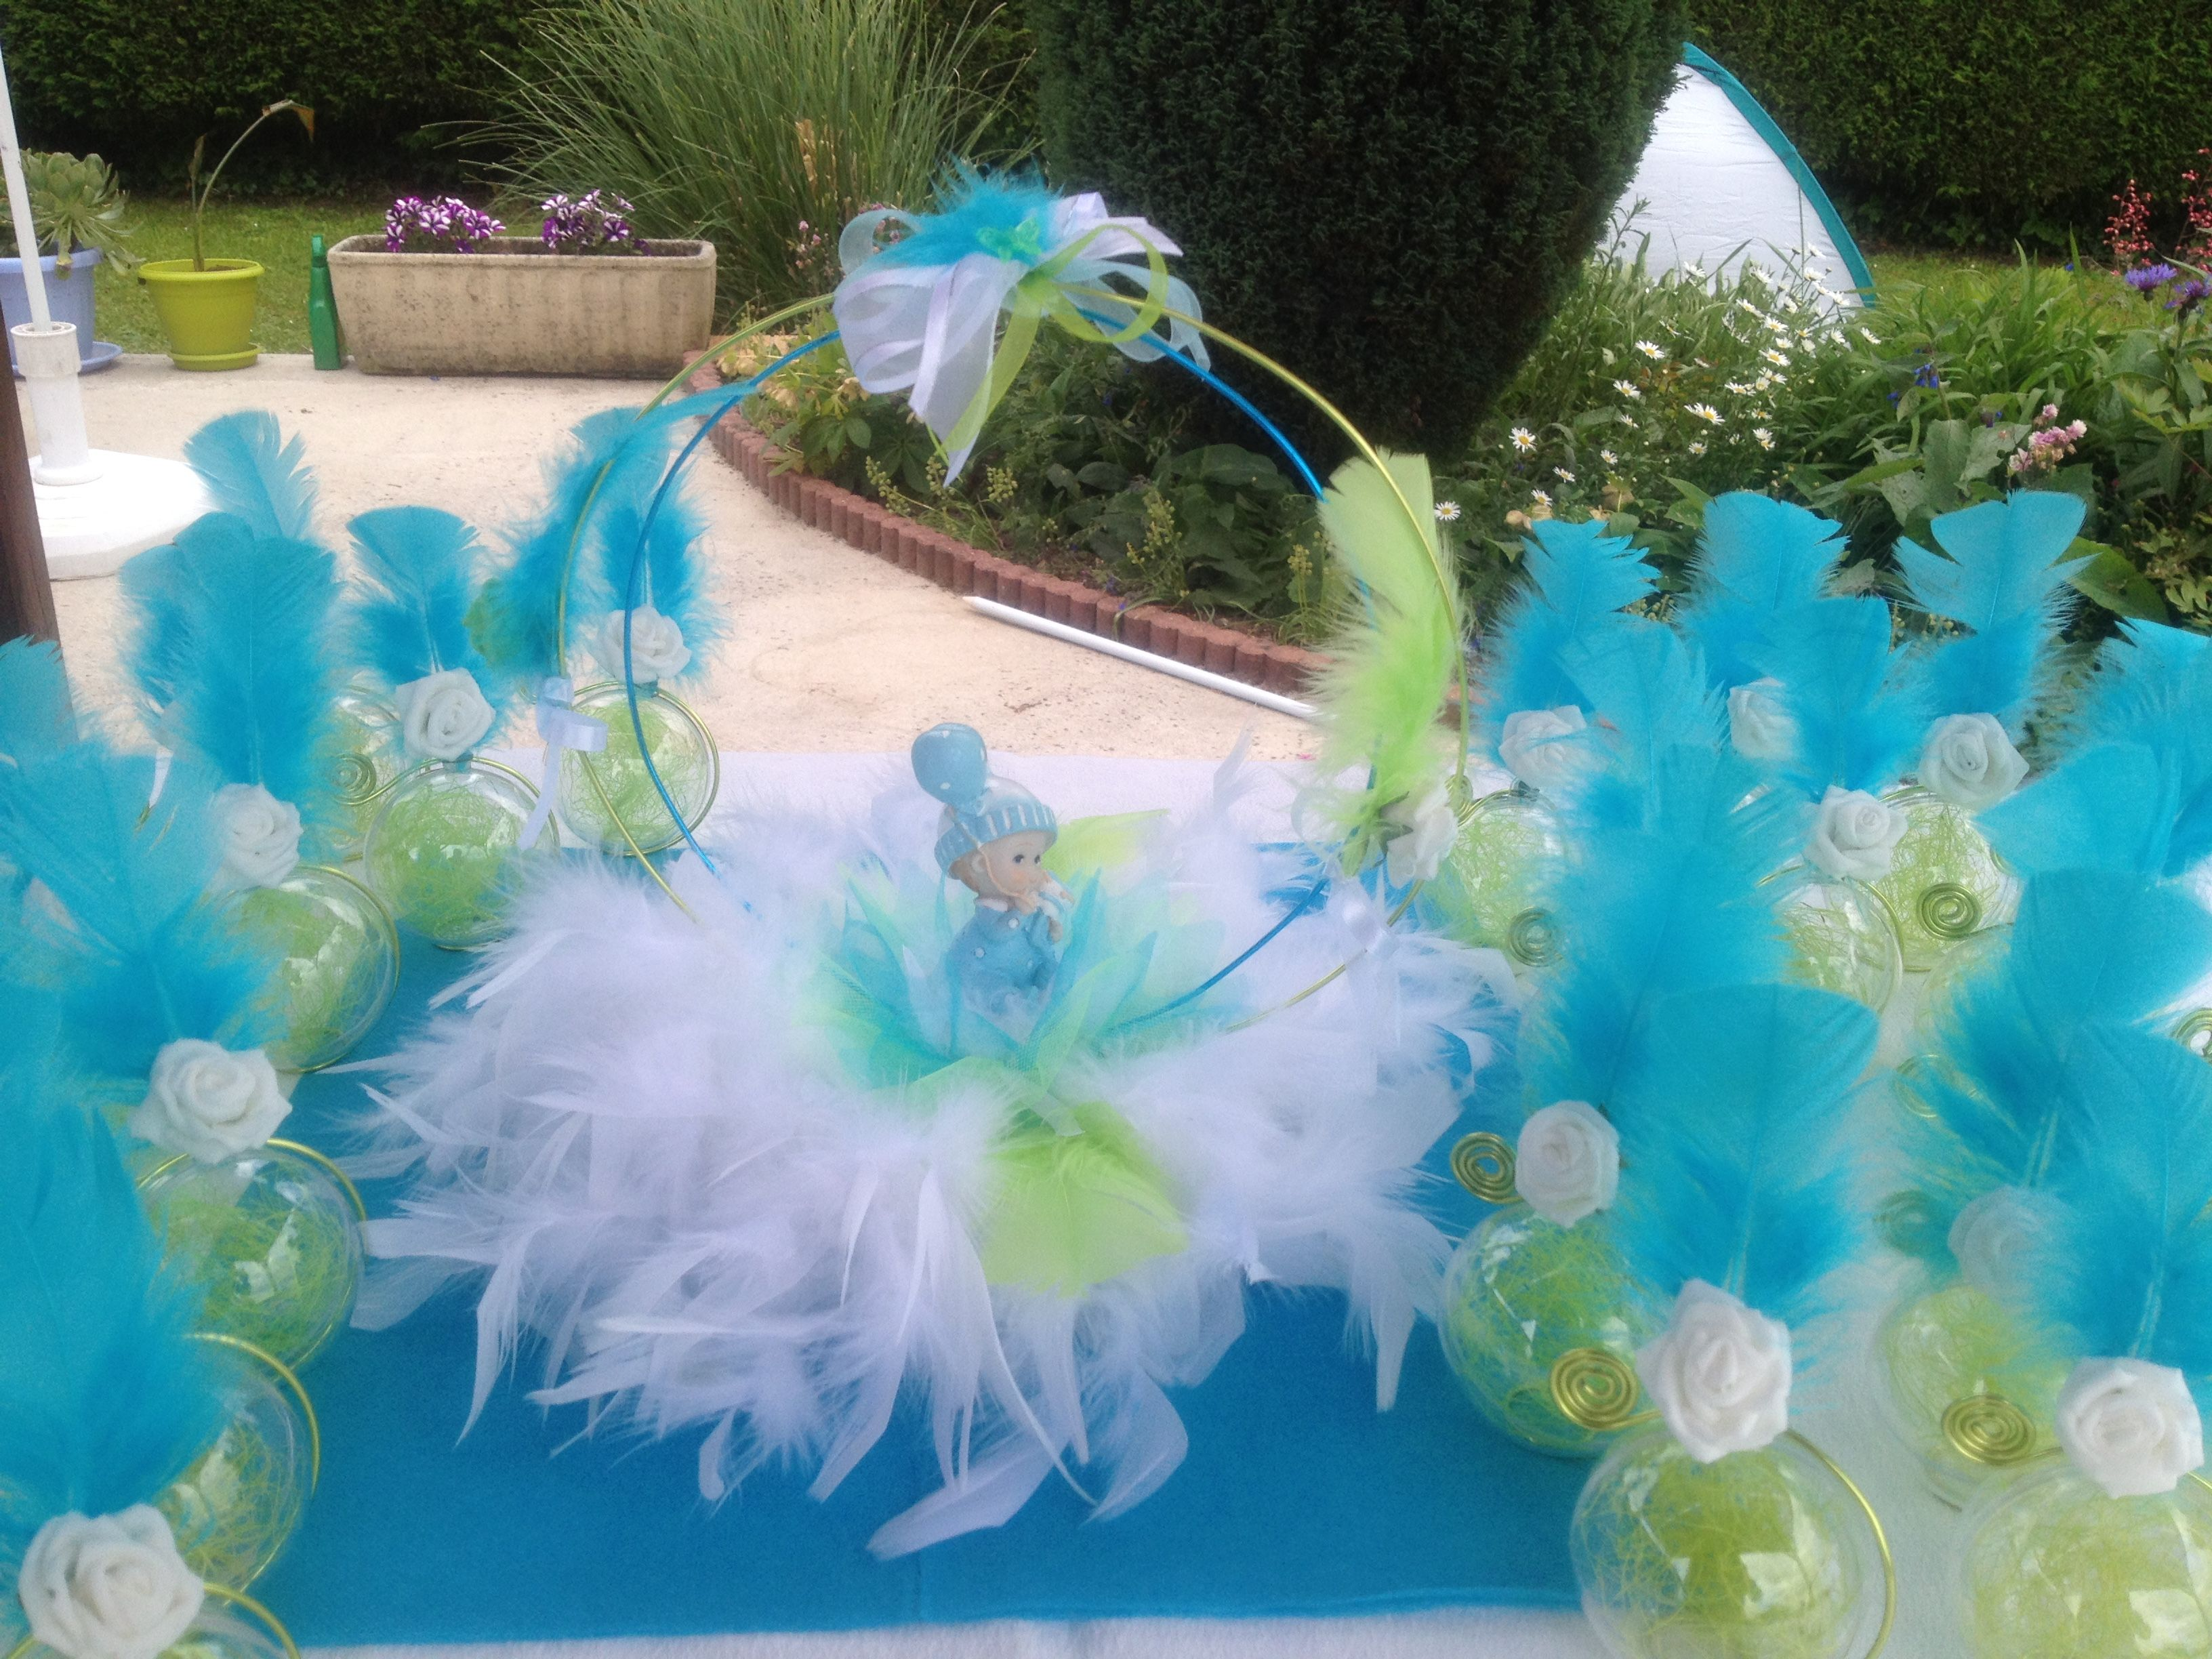 Centre de table bapt me gar on vert anis et bleu turquoise centre de table bapt me garcon - Centre de table bleu turquoise ...